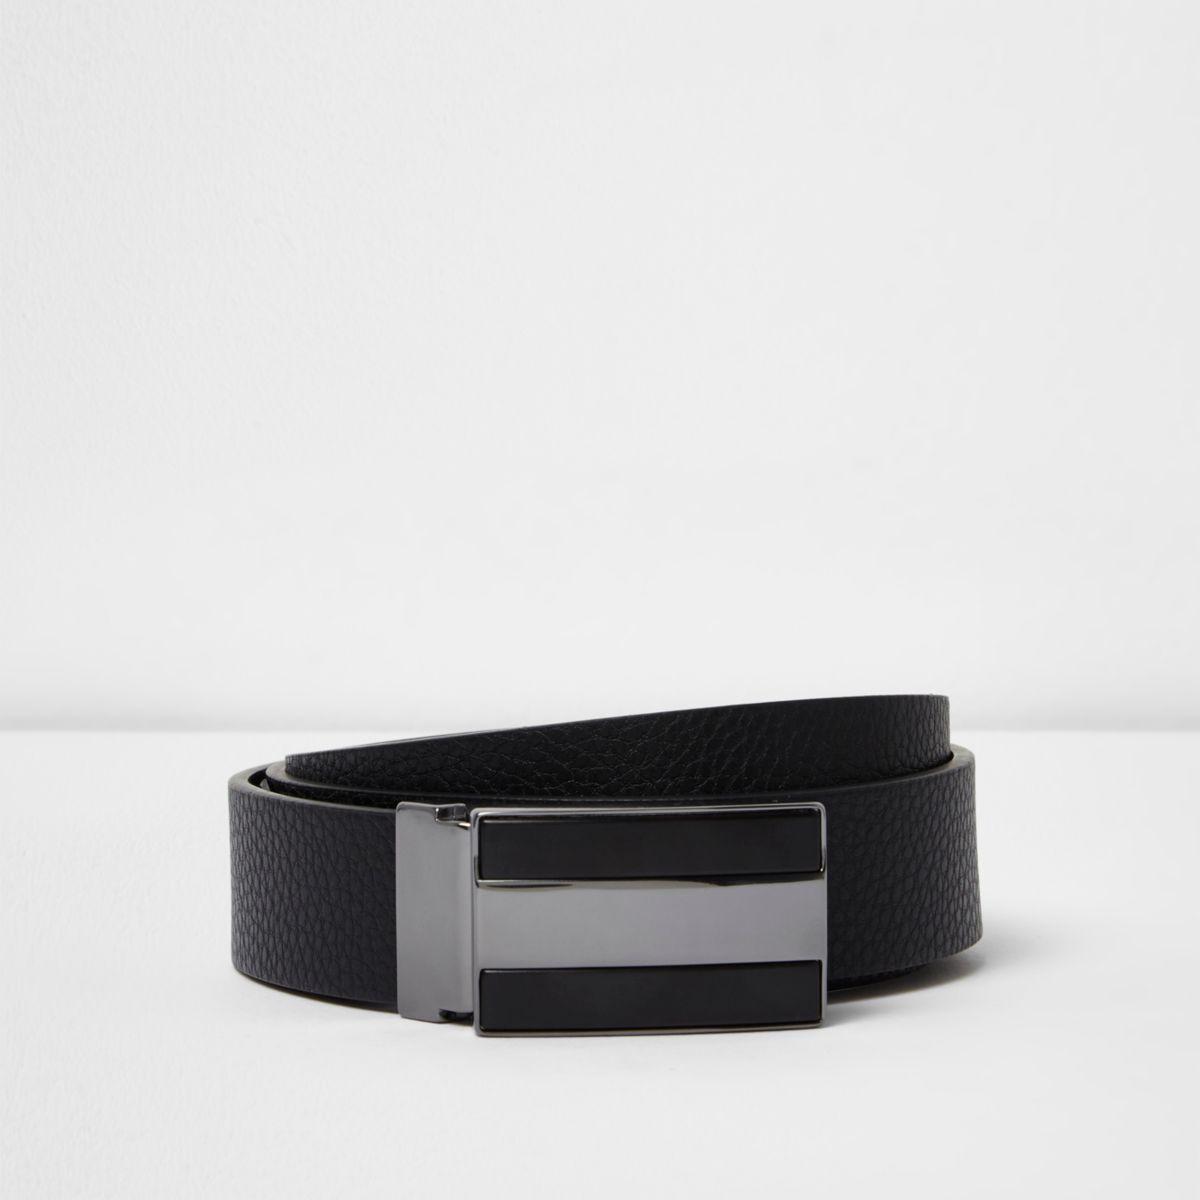 Black reversible leather plate buckle belt